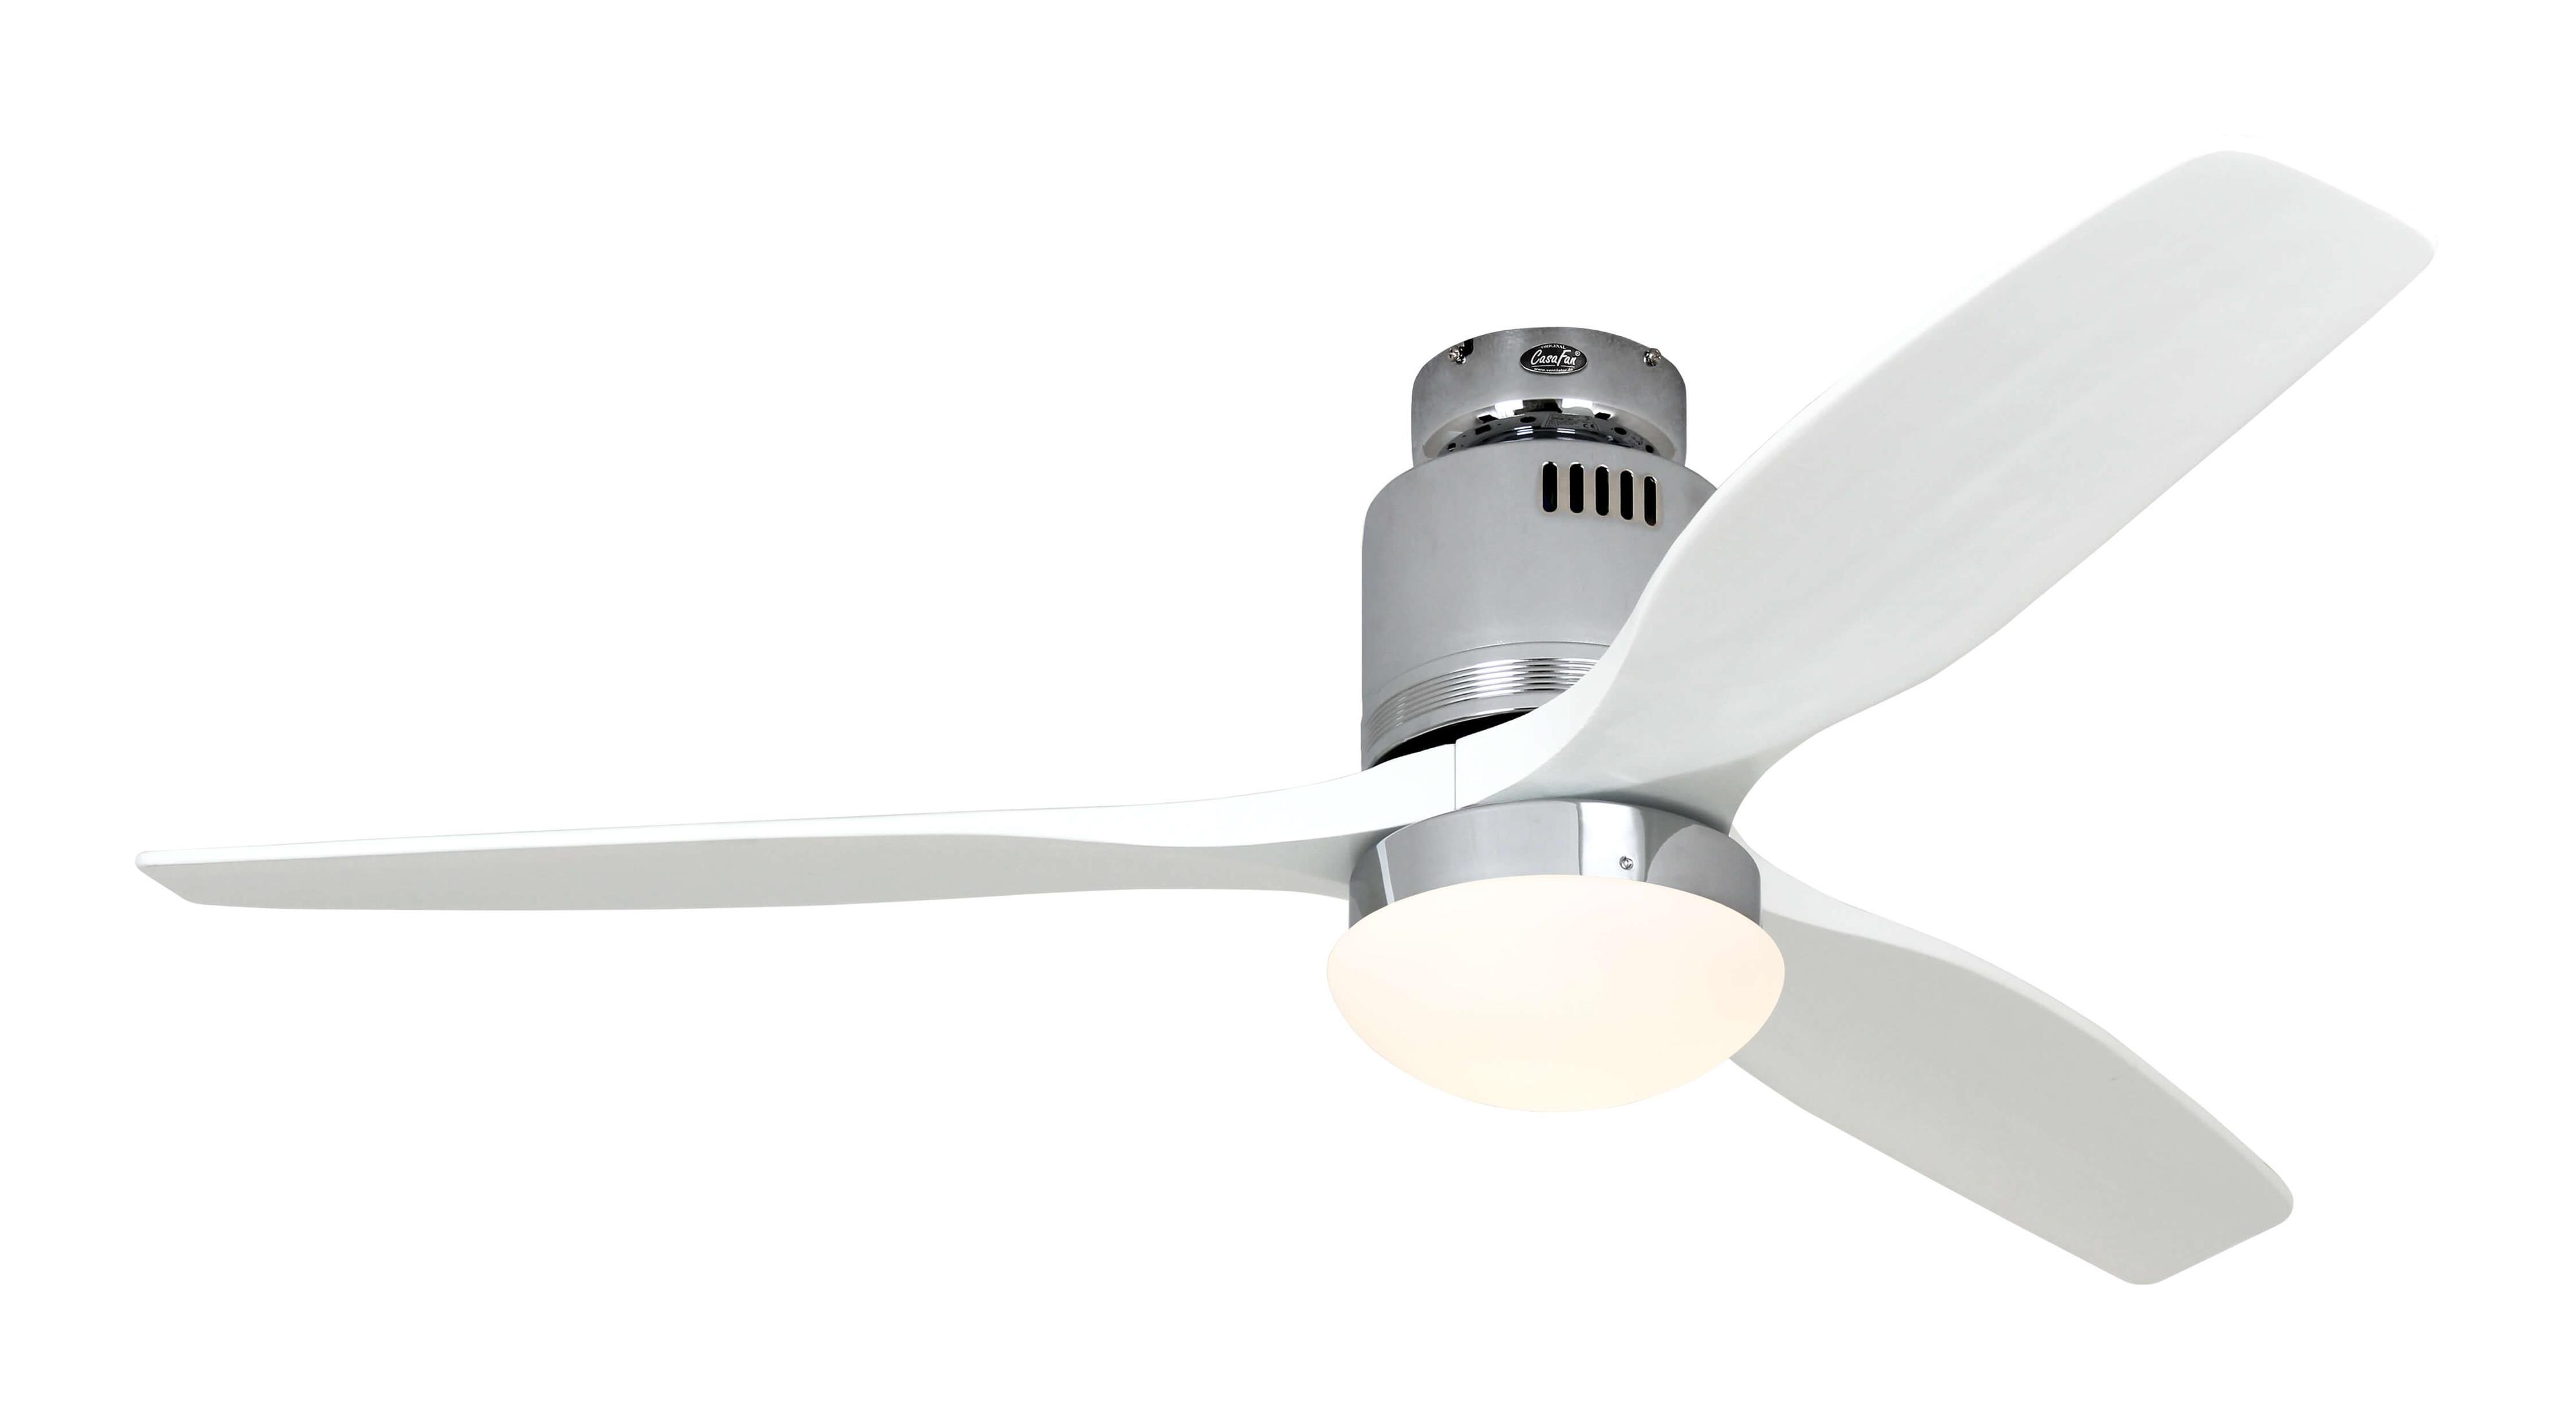 Ventilateur de plafond Aerodynamix Chrome Blanc